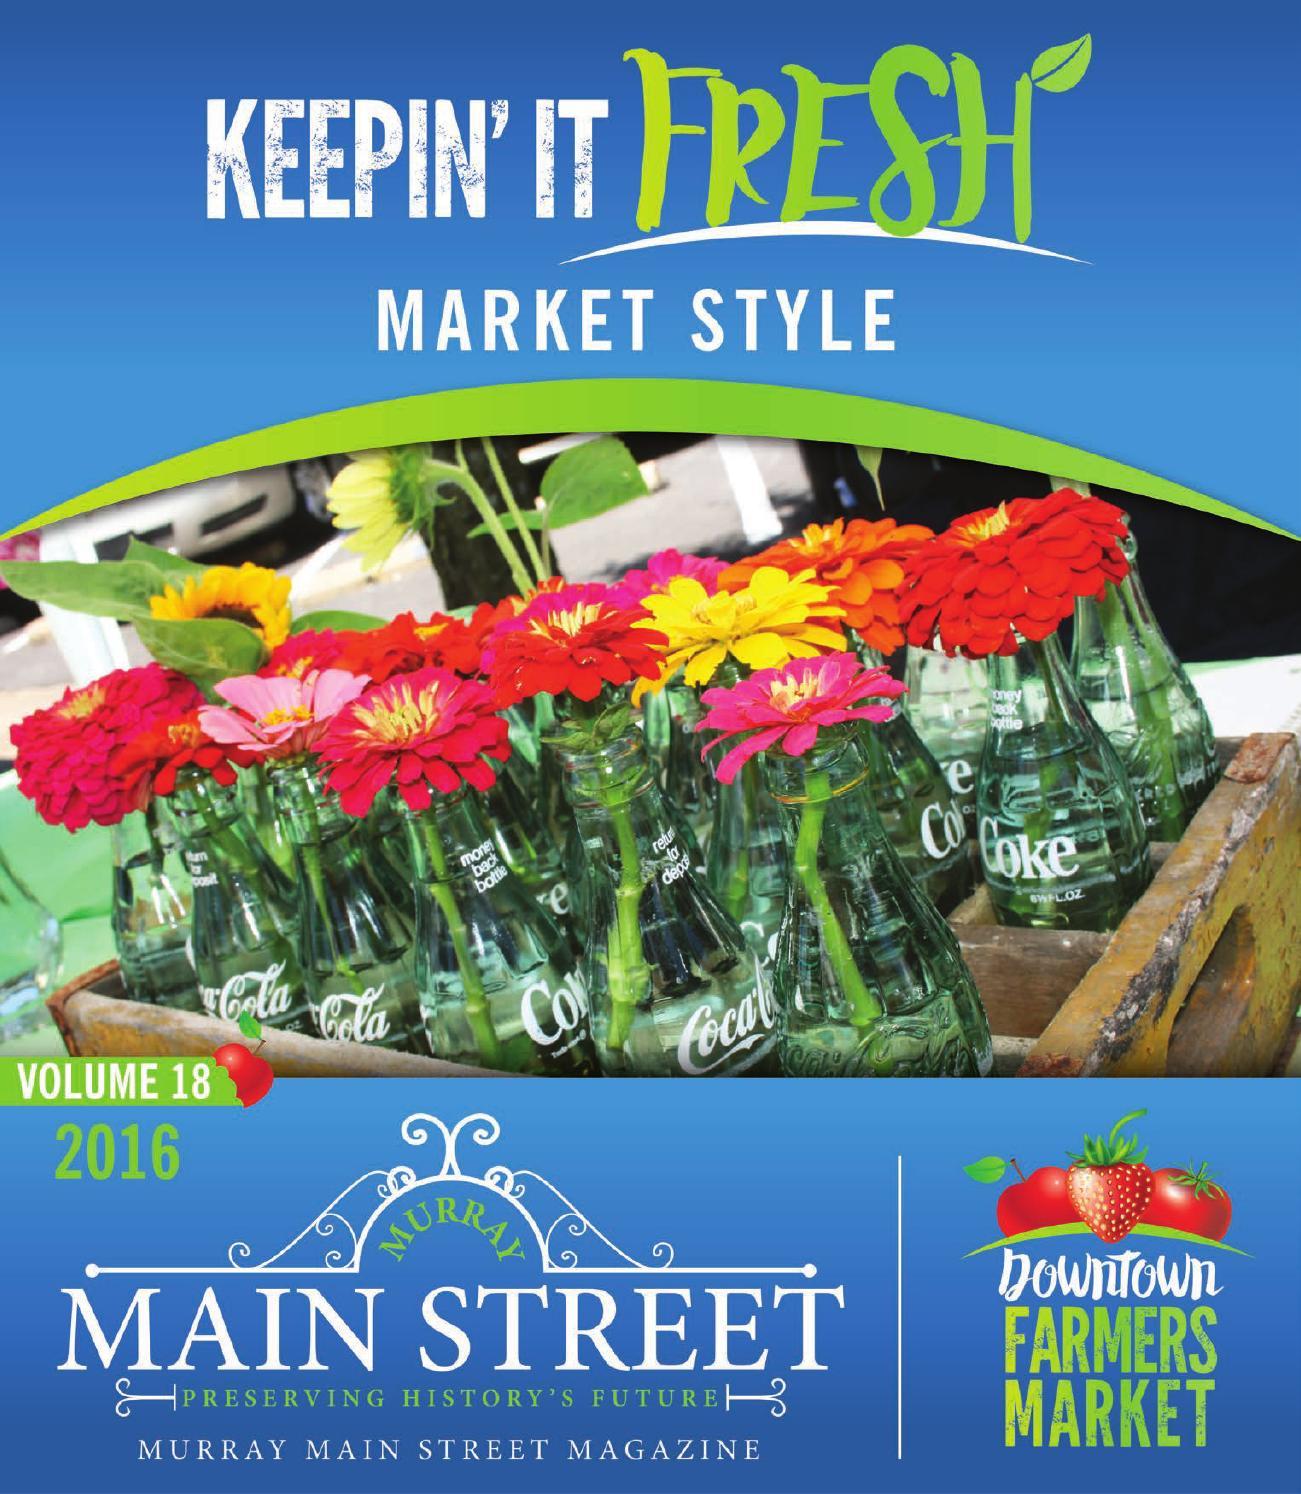 Murray Main Street Magazine by Helix Creative, LLC - issuu